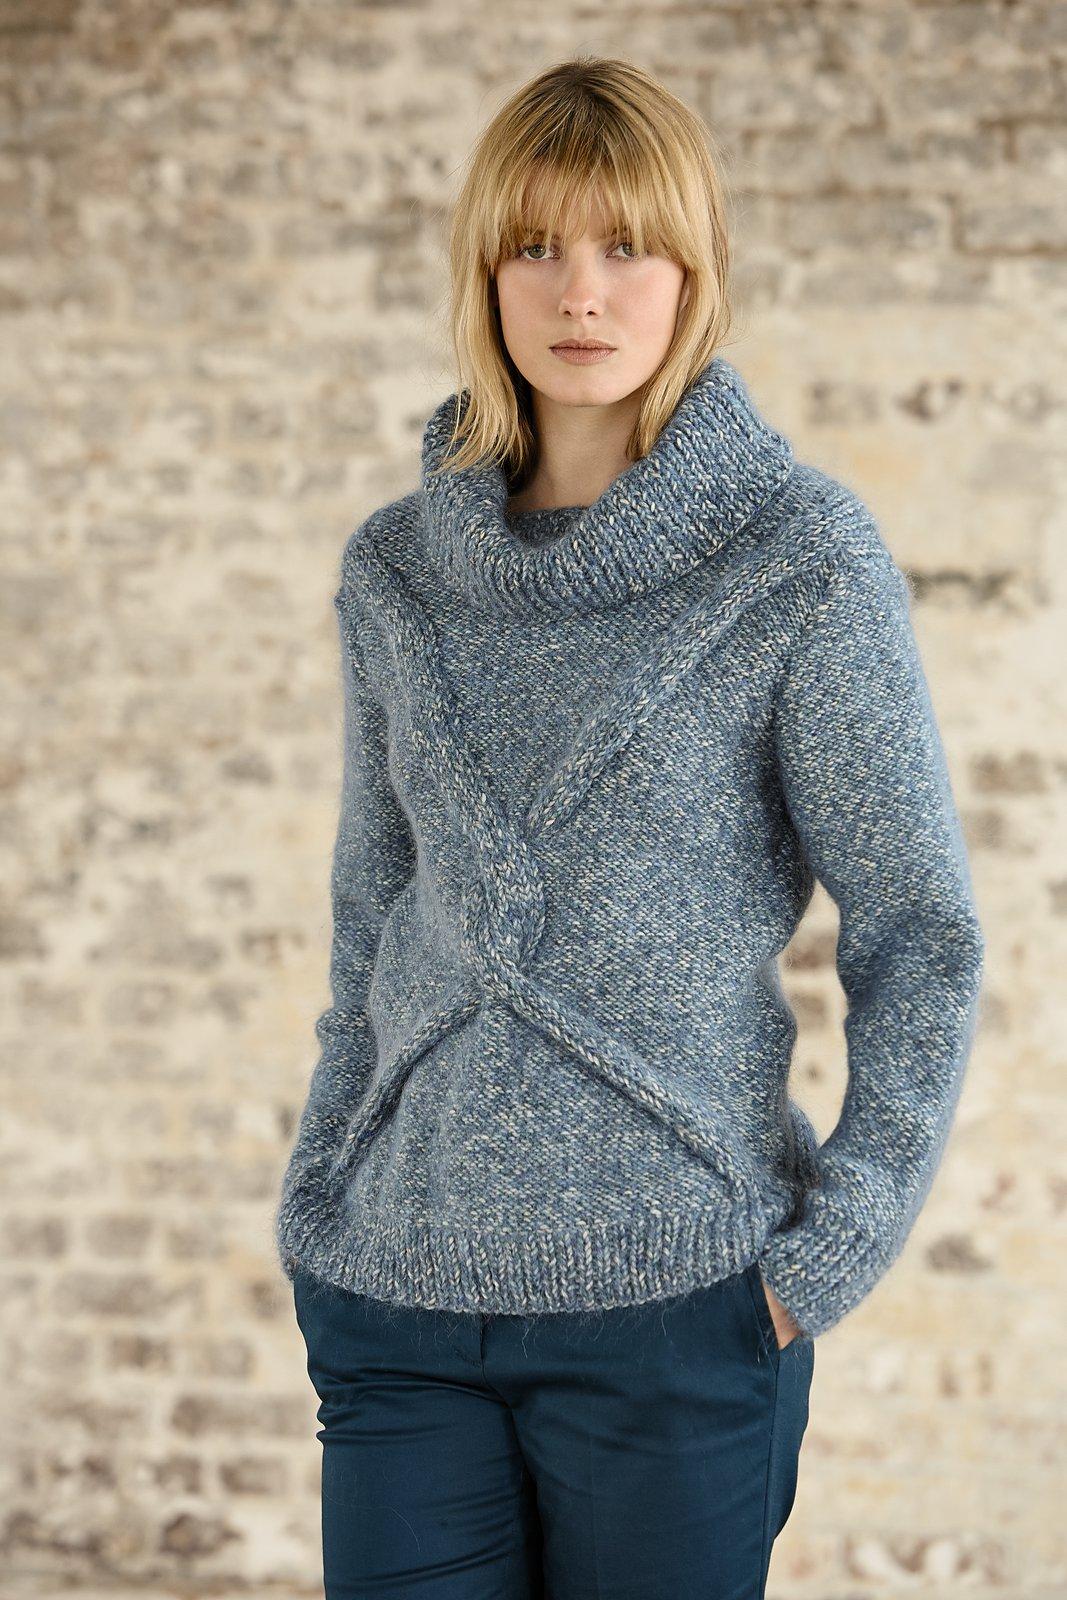 Женский свитер спицами со схемами 2015 2016 фото 517